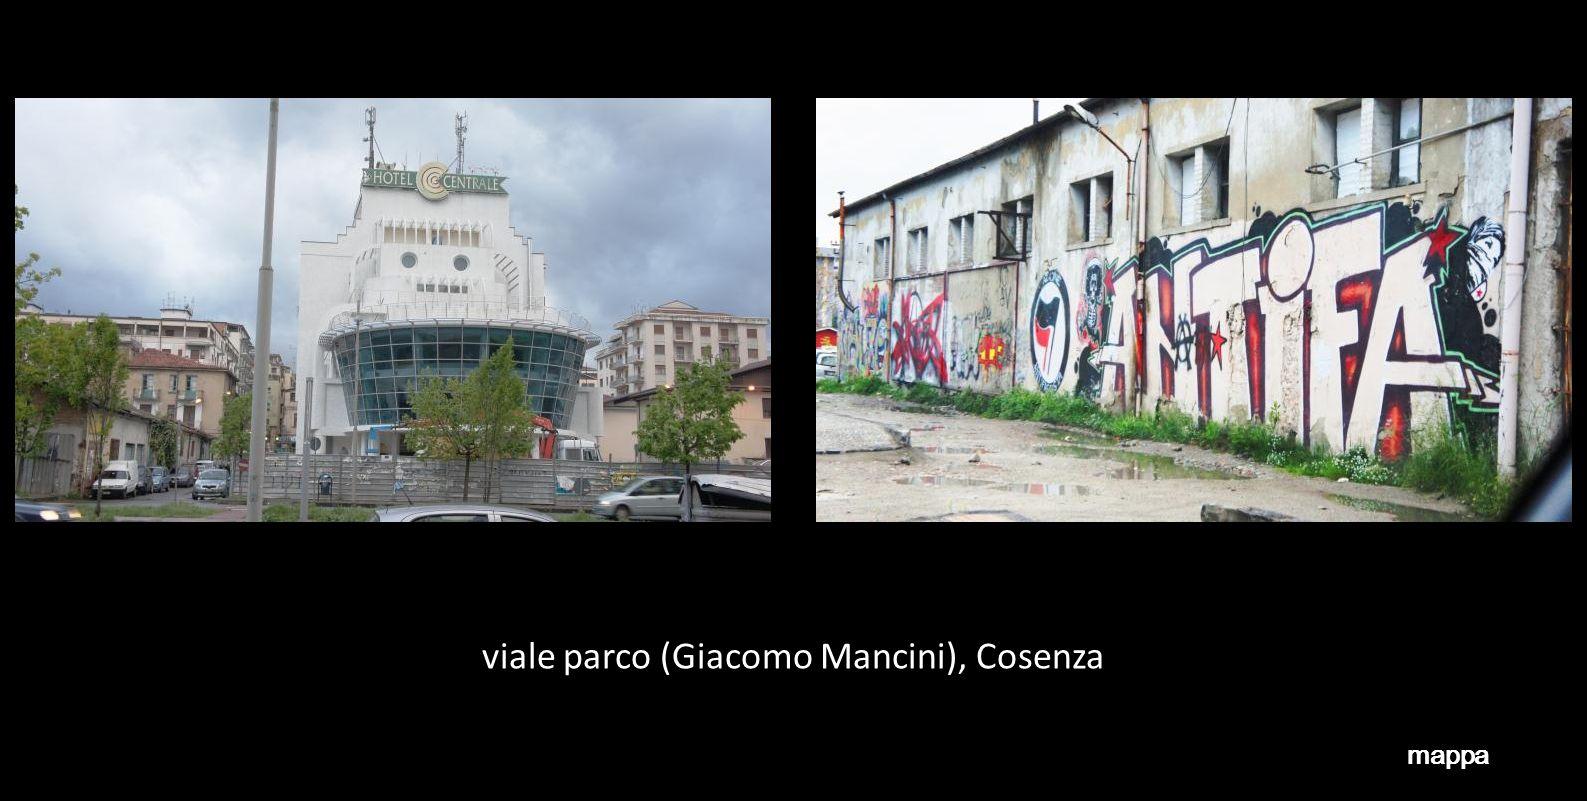 traversa via Popilia, Cosenza mappa